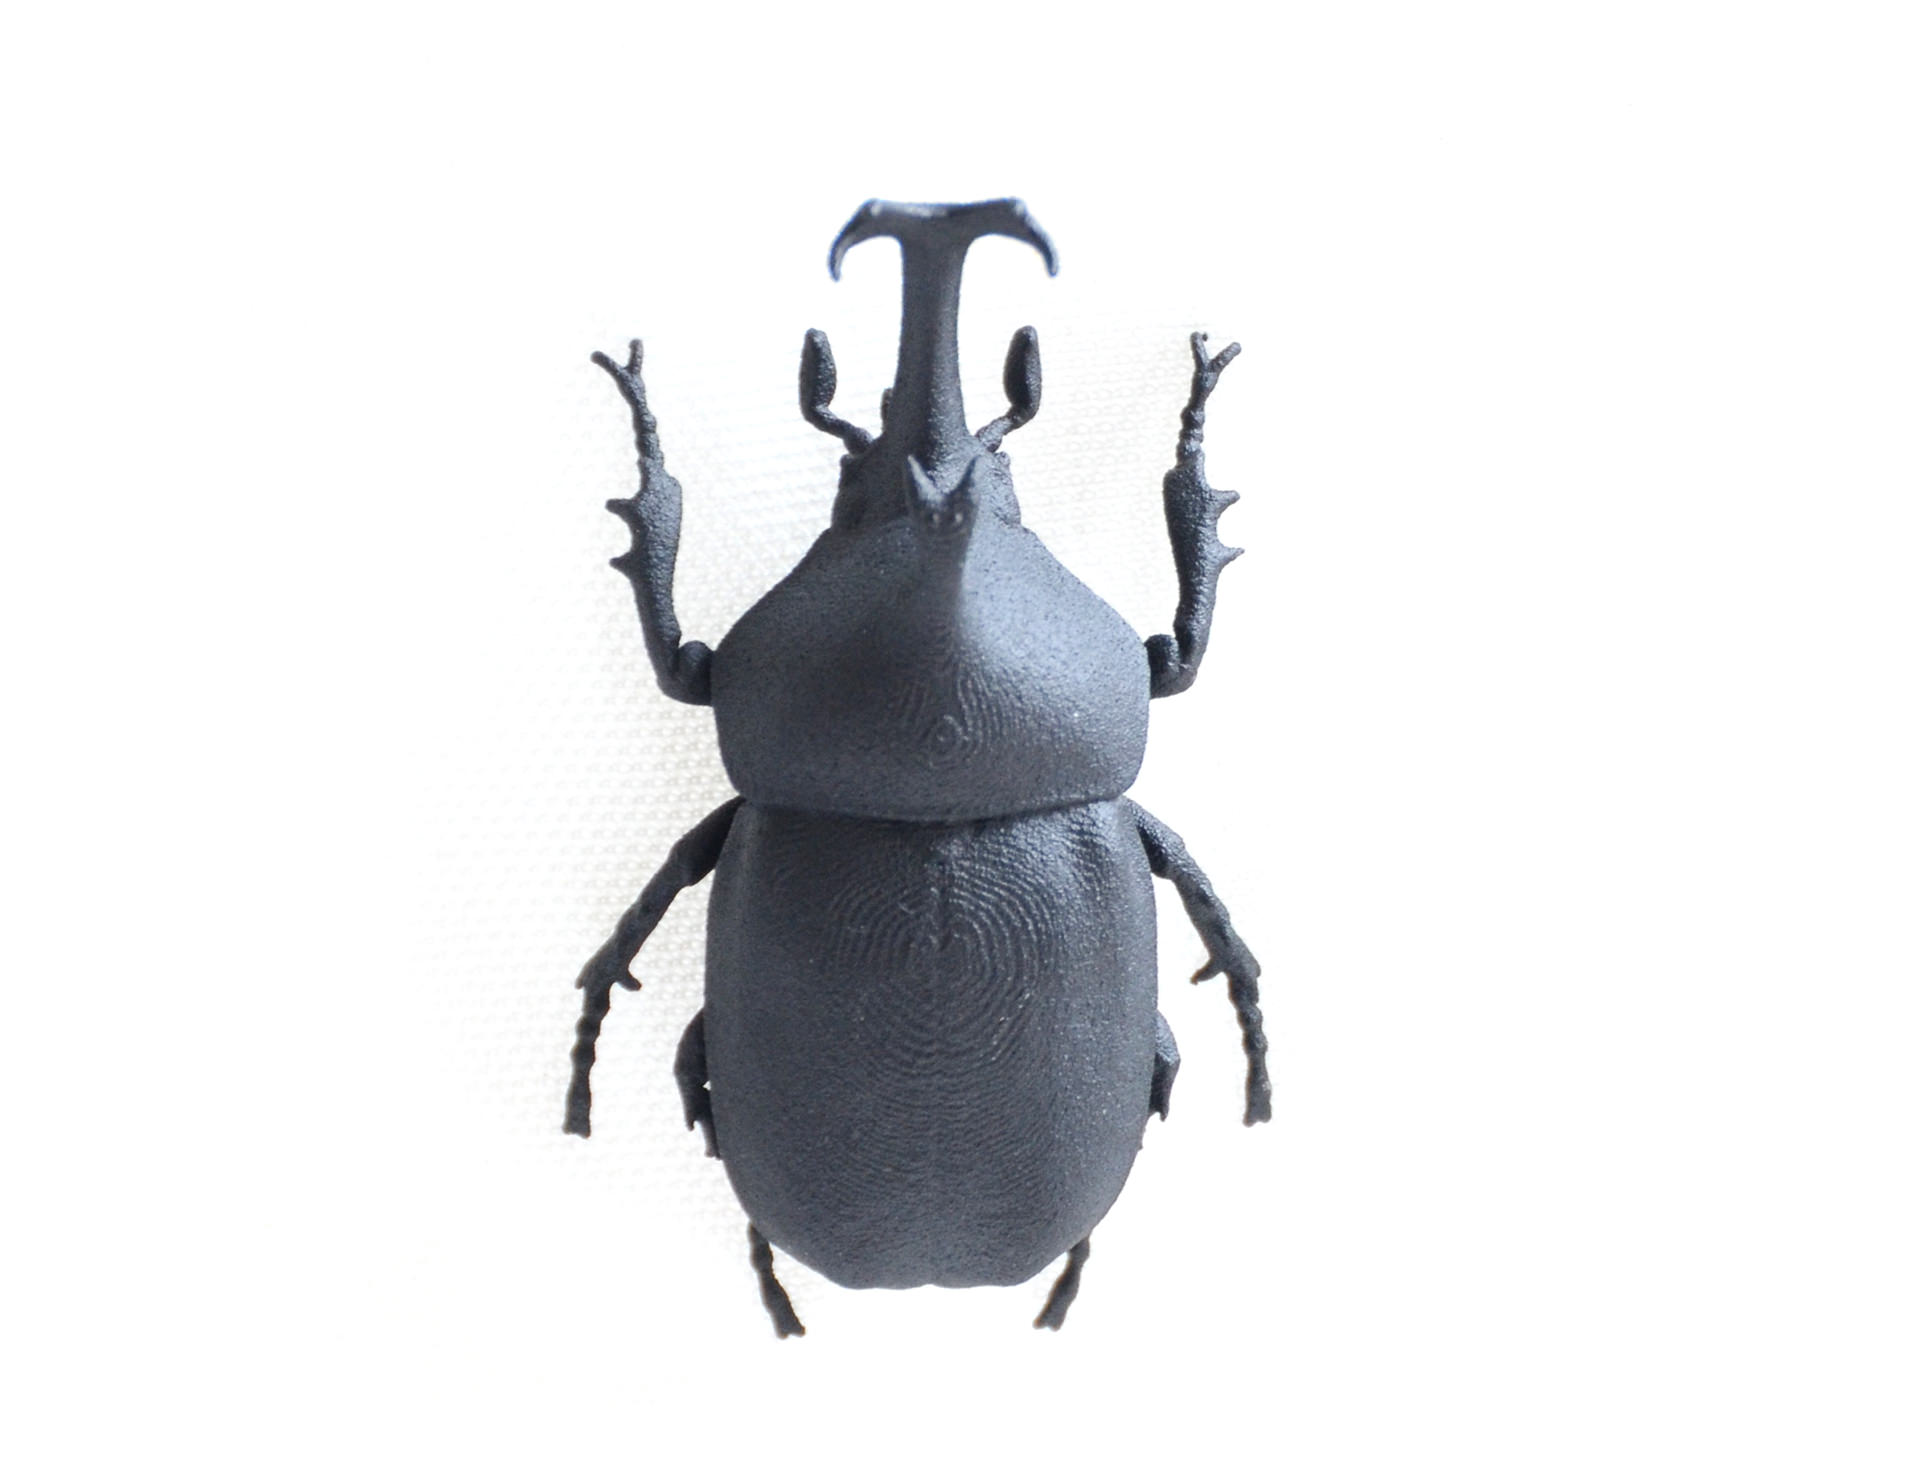 3d-printing-beetle-idarts-4